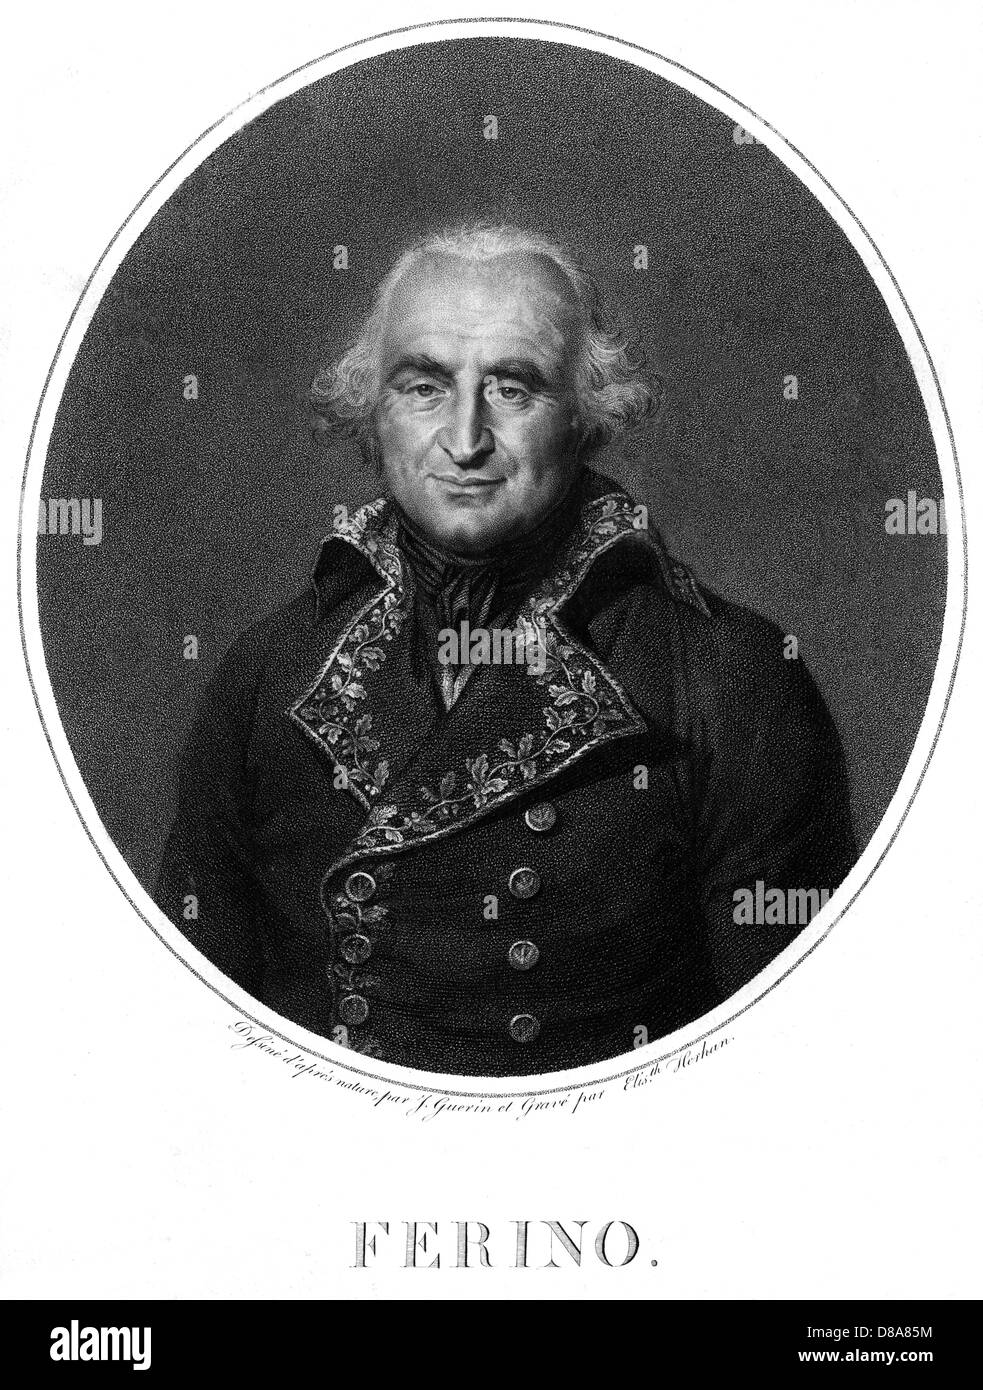 Comte Pierre Ferino Stock Photo